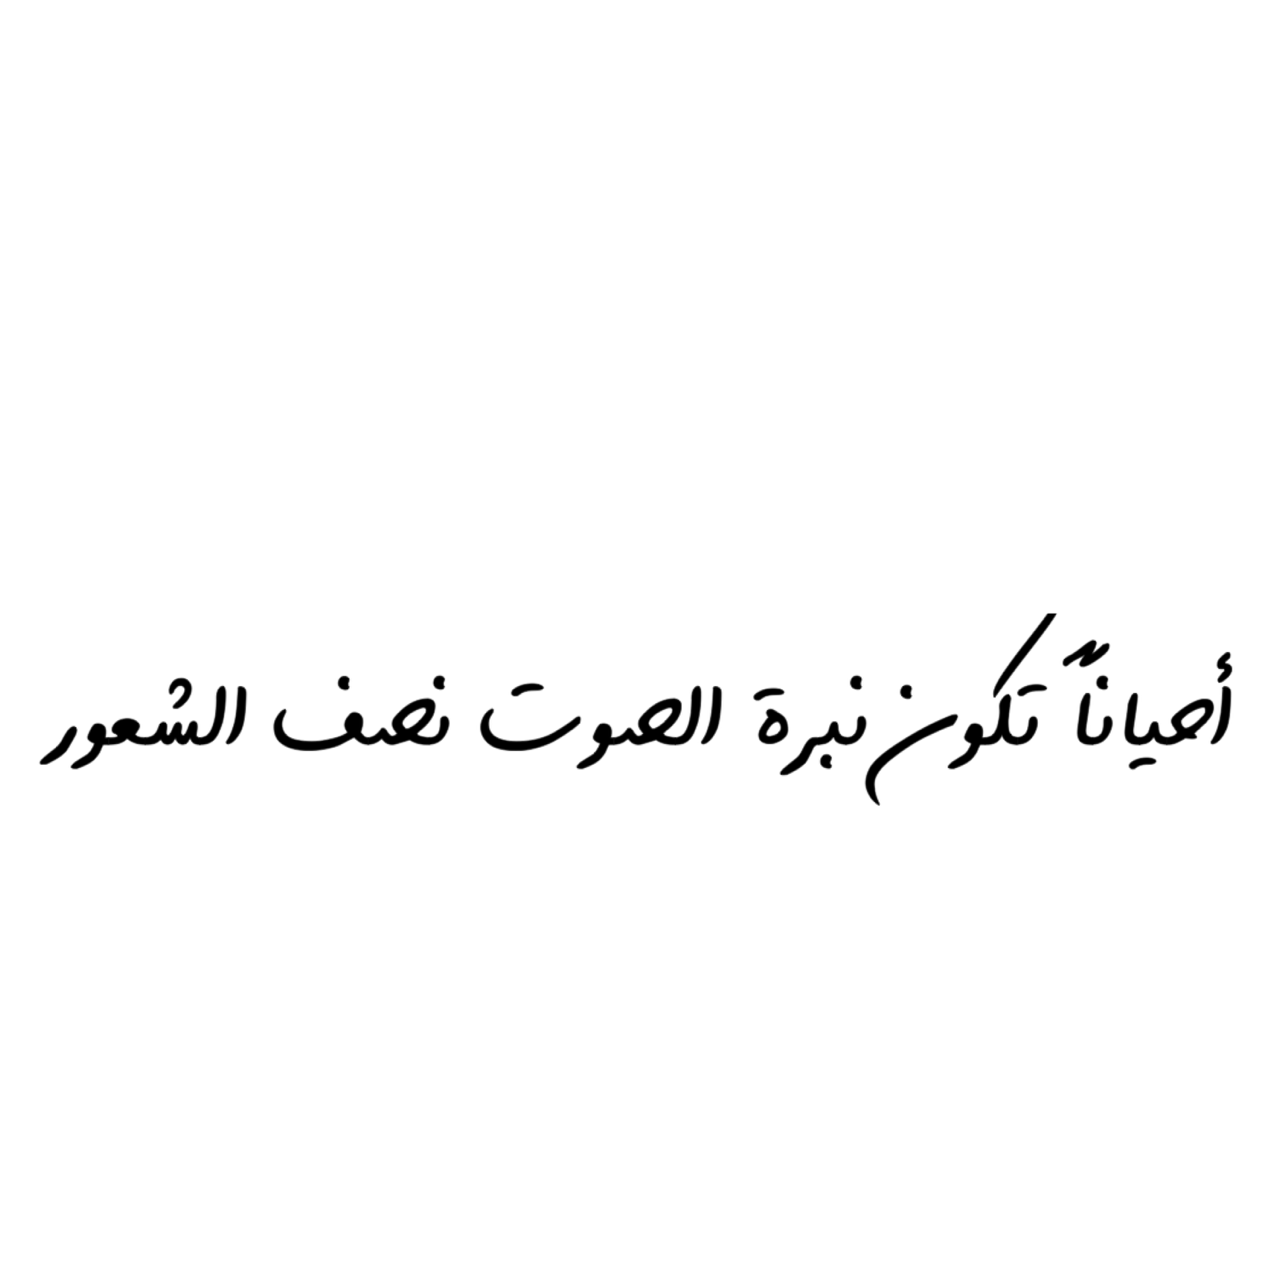 هتان ٱحيانا تكون نبرة الصوت نصف الشعور Sraaab7 Words Quotes Short Quotes Love Photo Quotes